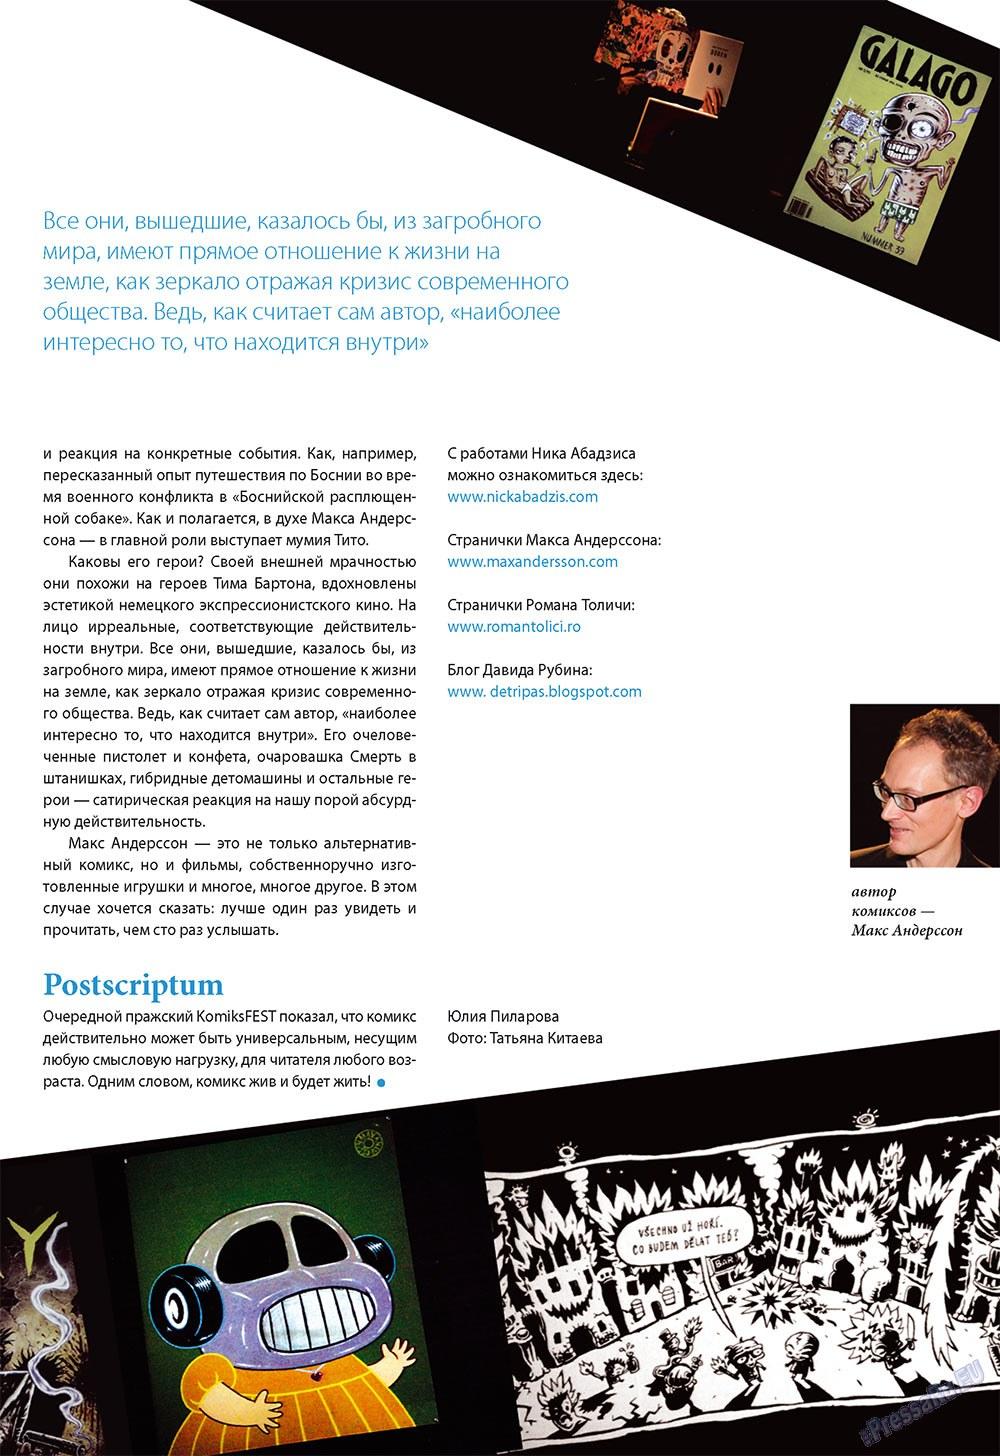 Артек (журнал). 2009 год, номер 6, стр. 31